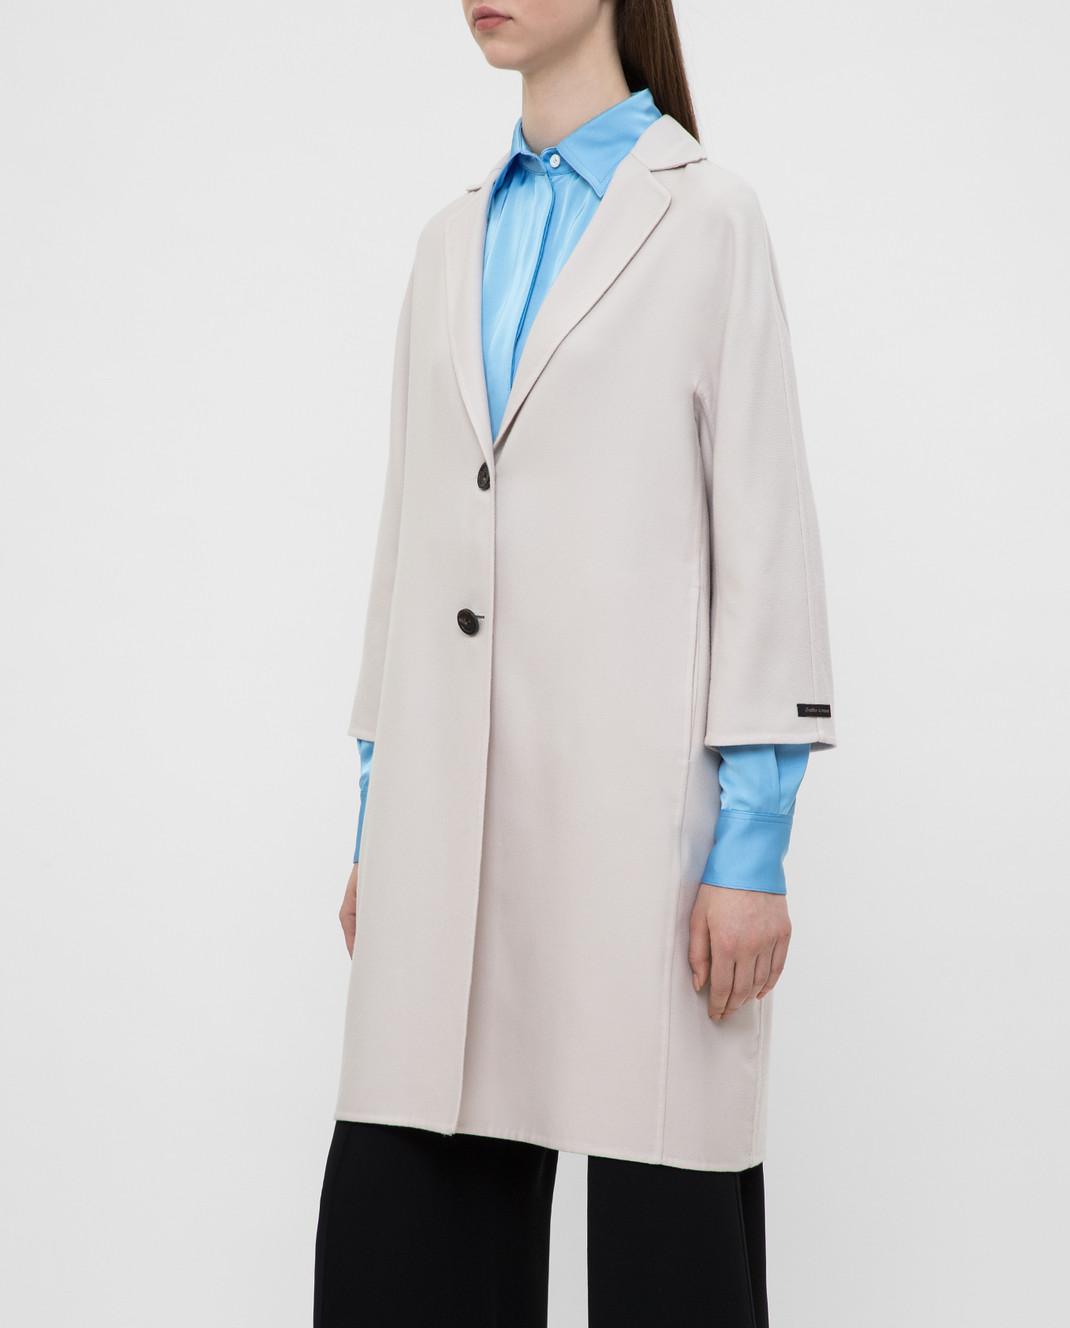 Peserico Светло-бежевое пальто из кашемира и шерсти S20493E изображение 3